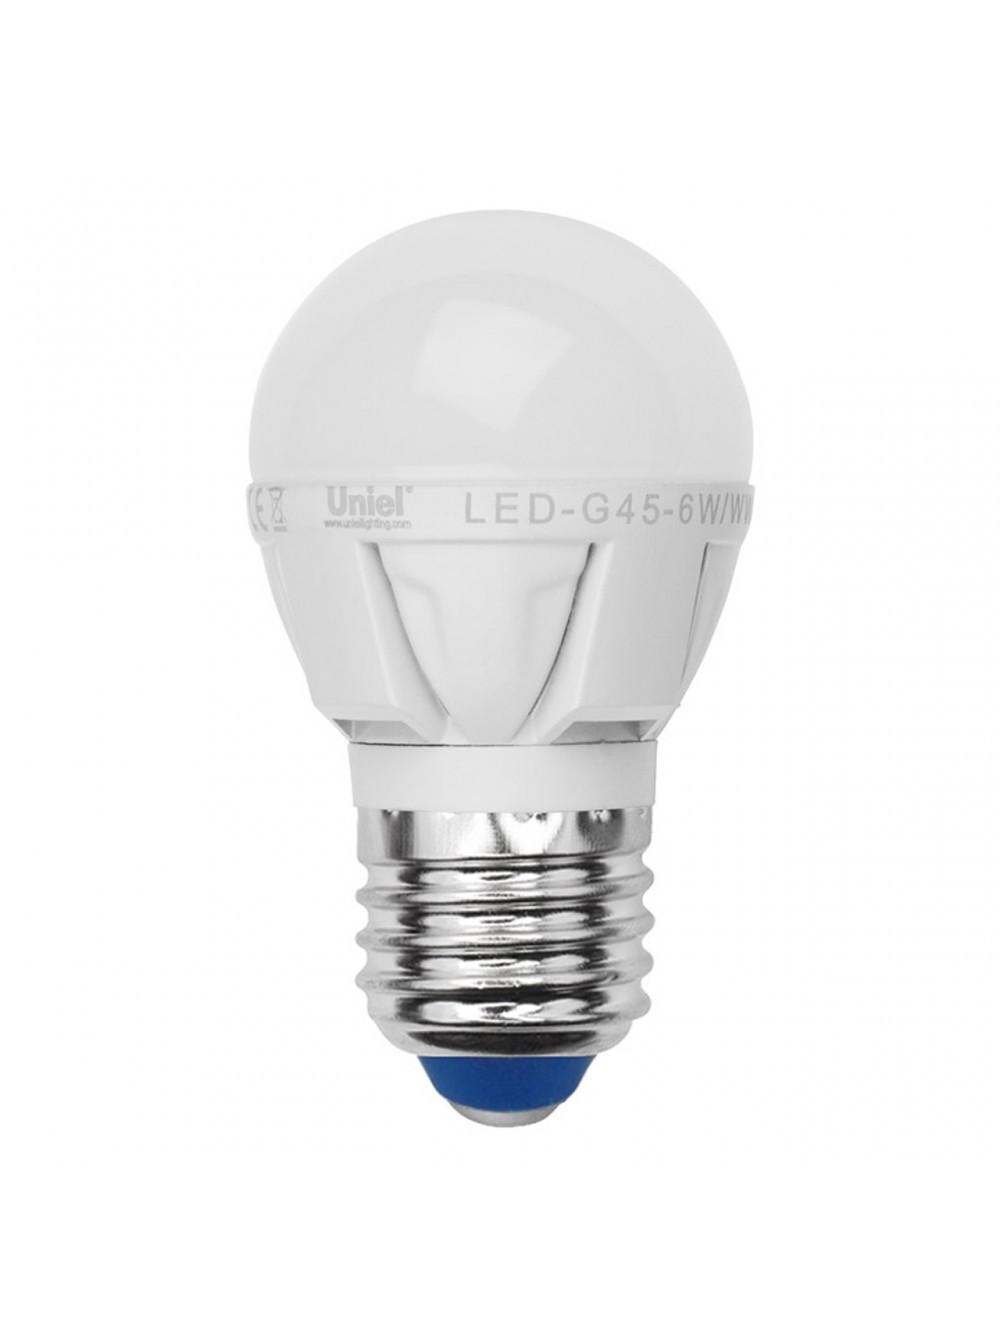 Лампа светодиодная Uniel Led-g45-7w/ww/e27/fr plp01wh лампа светодиодная uniel led a60 11w ww e27 fr dim plp01wh